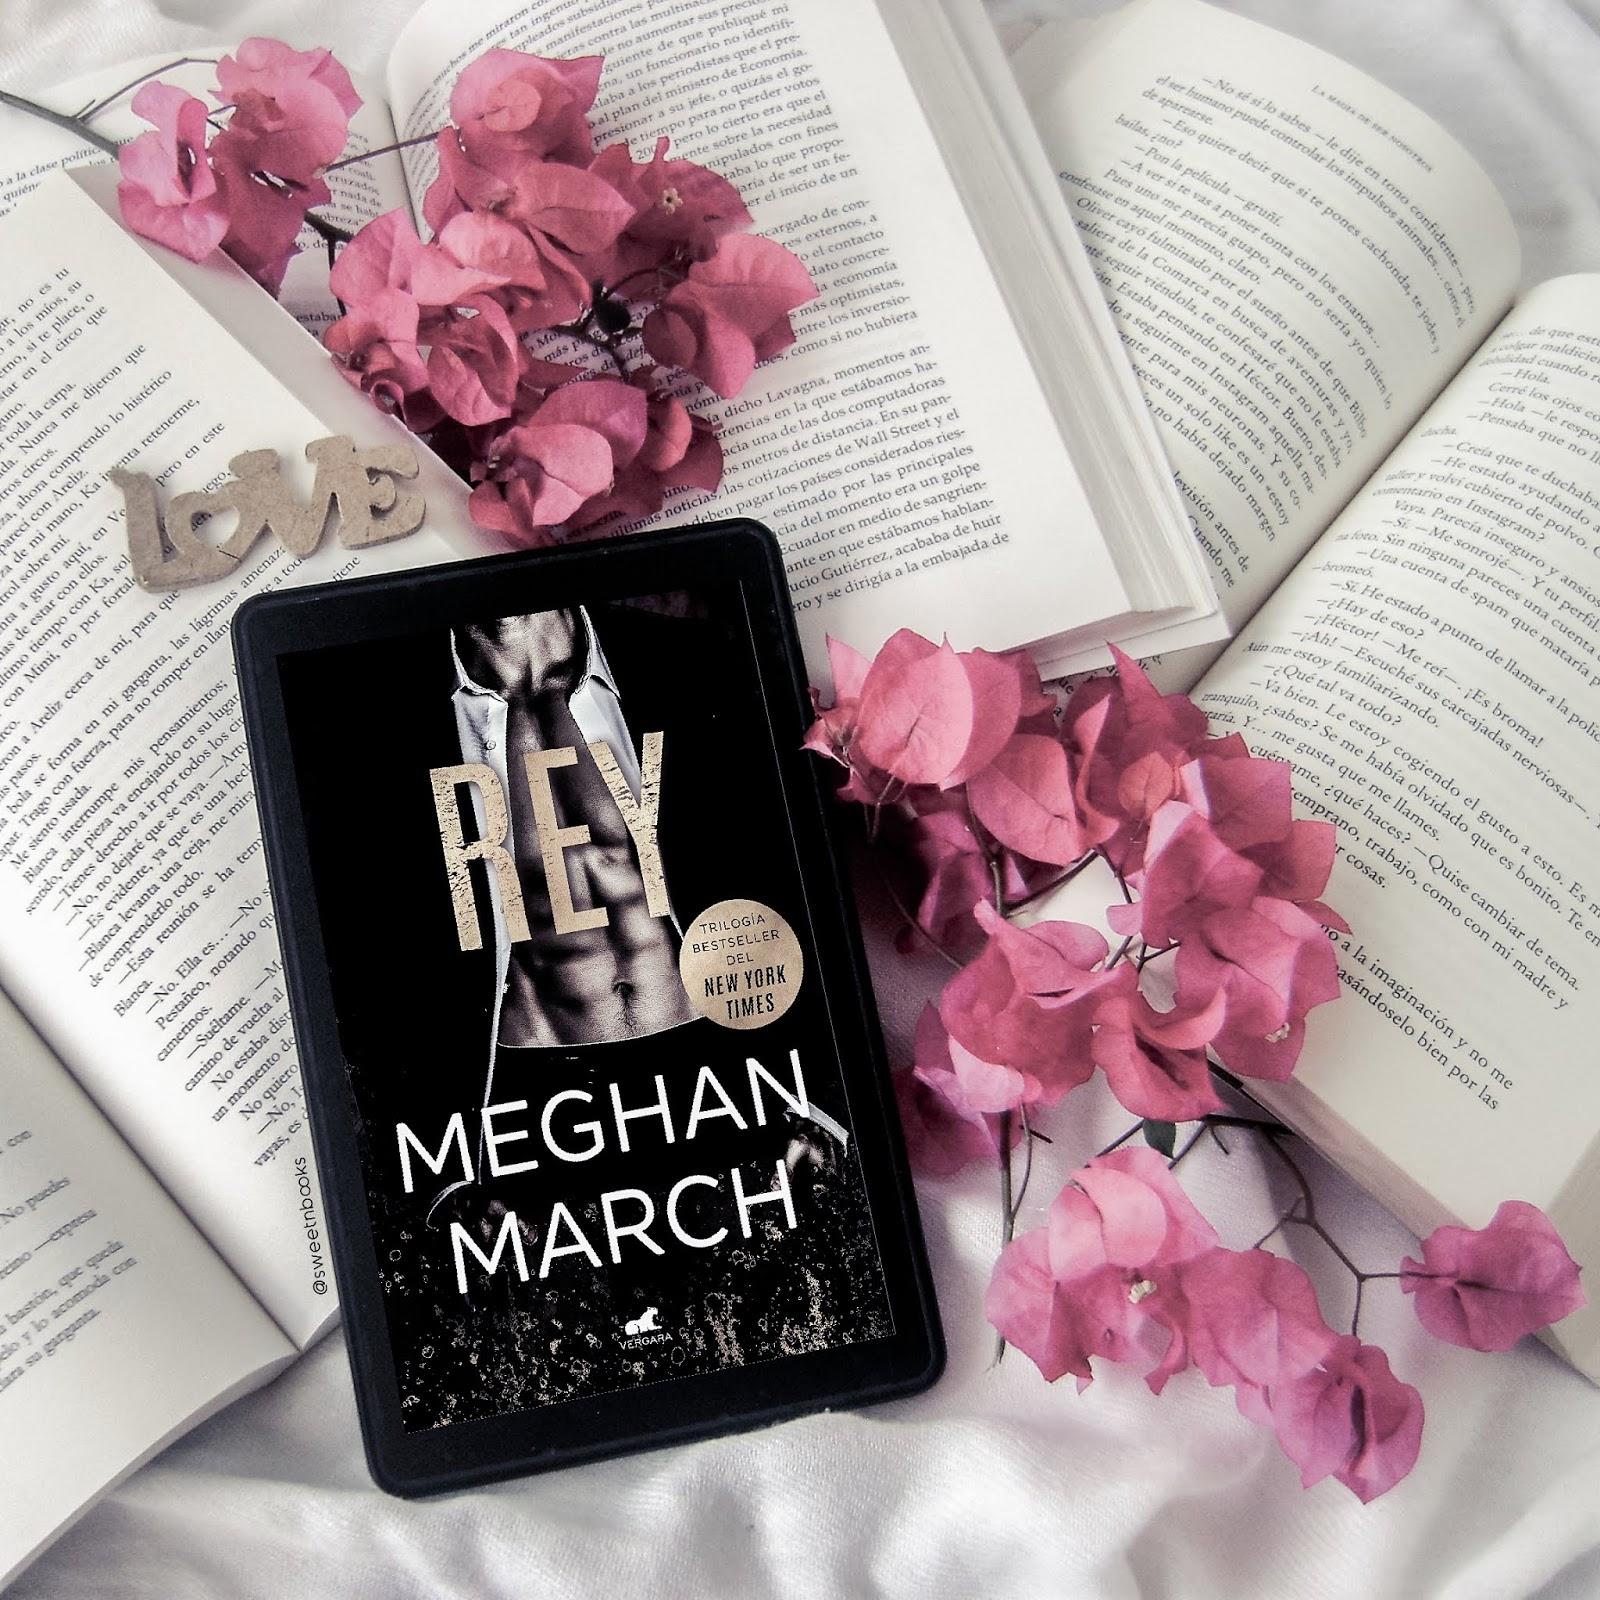 Rey_Meghan-March